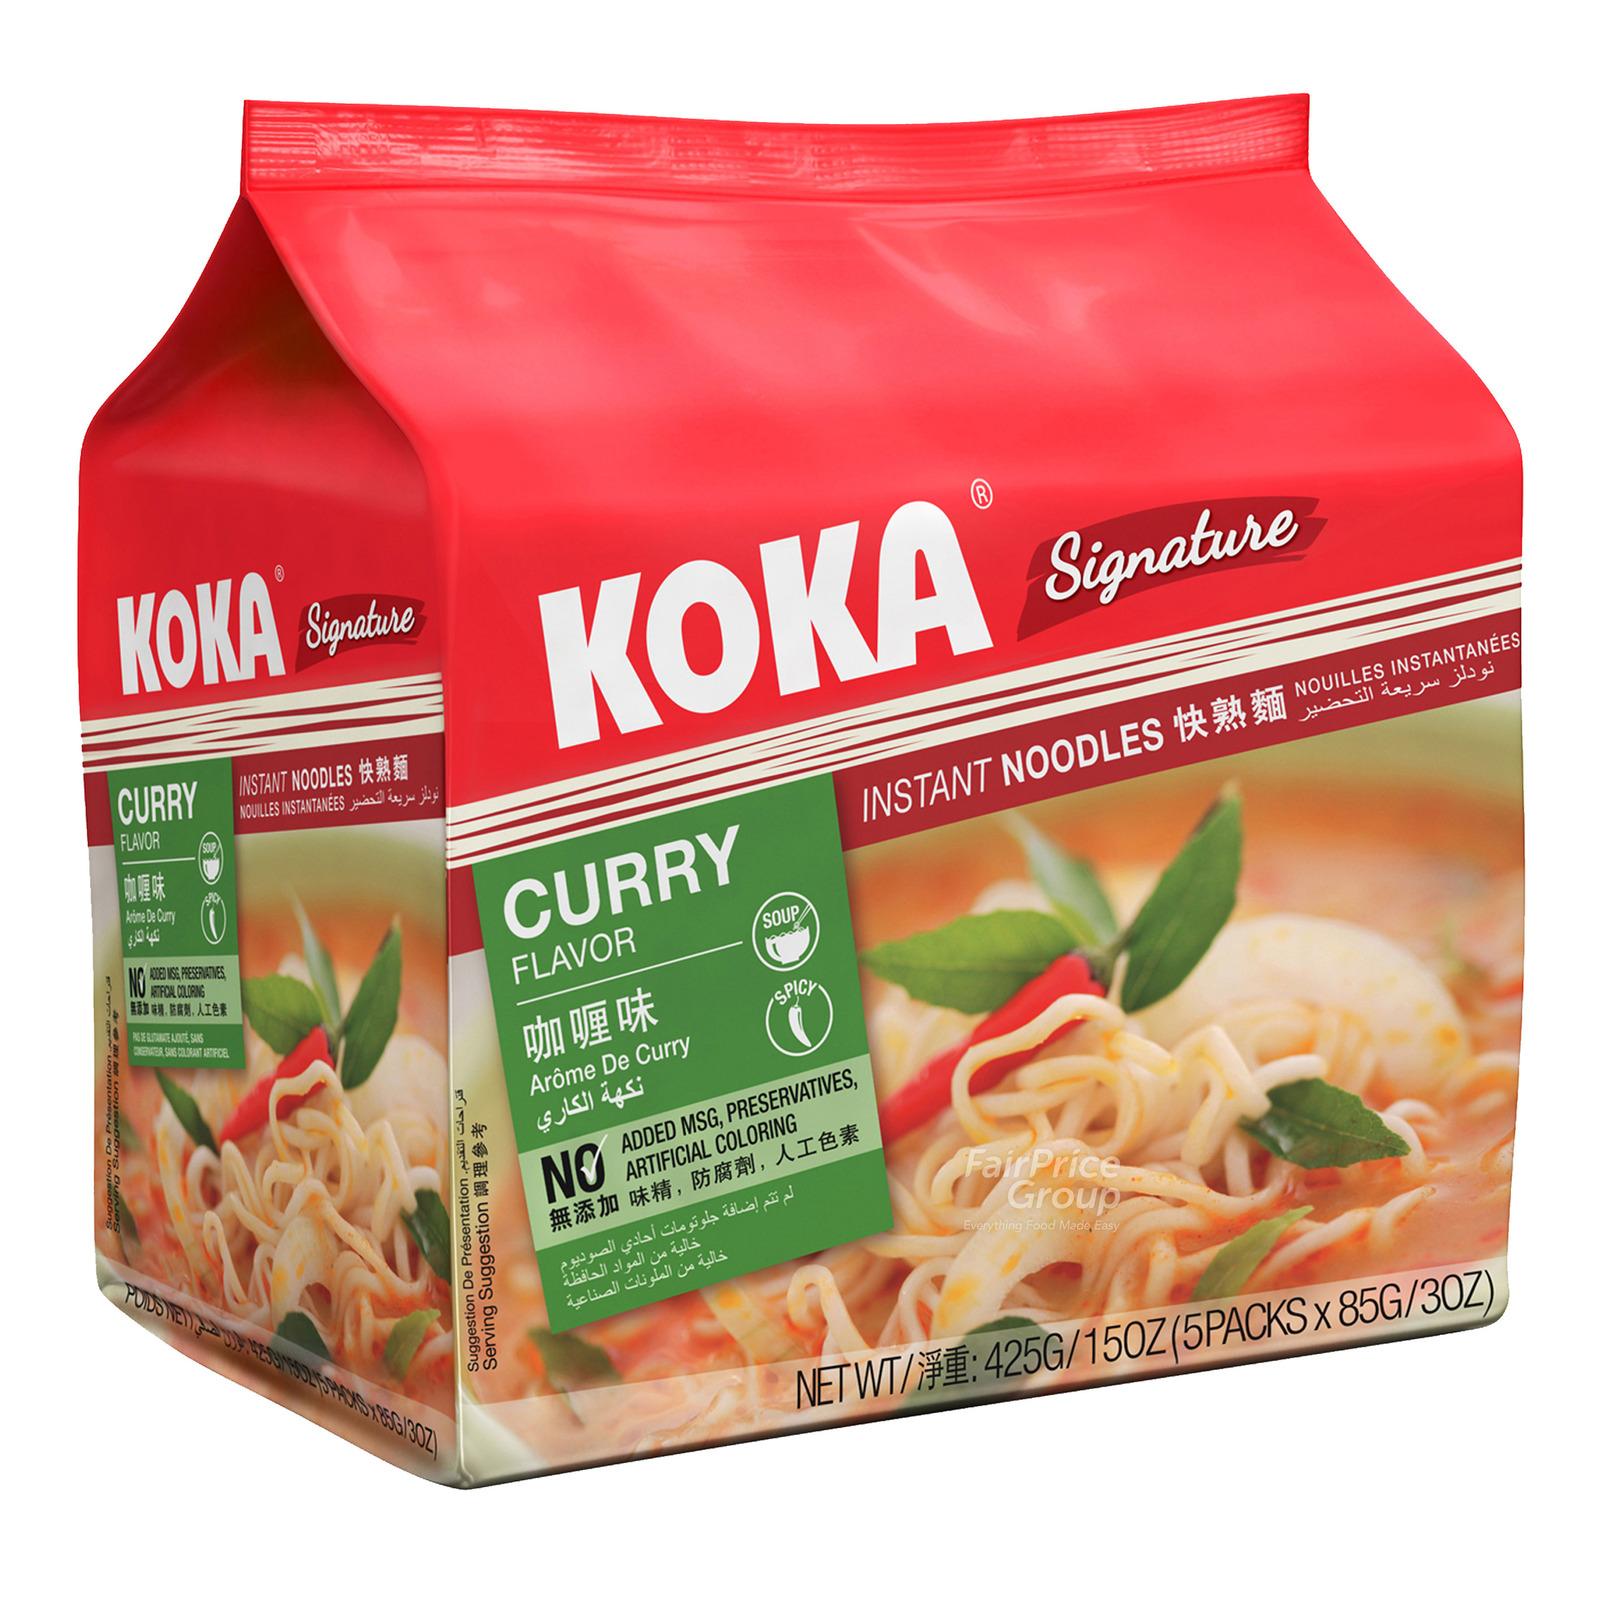 Koka Instant Noodles - Curry